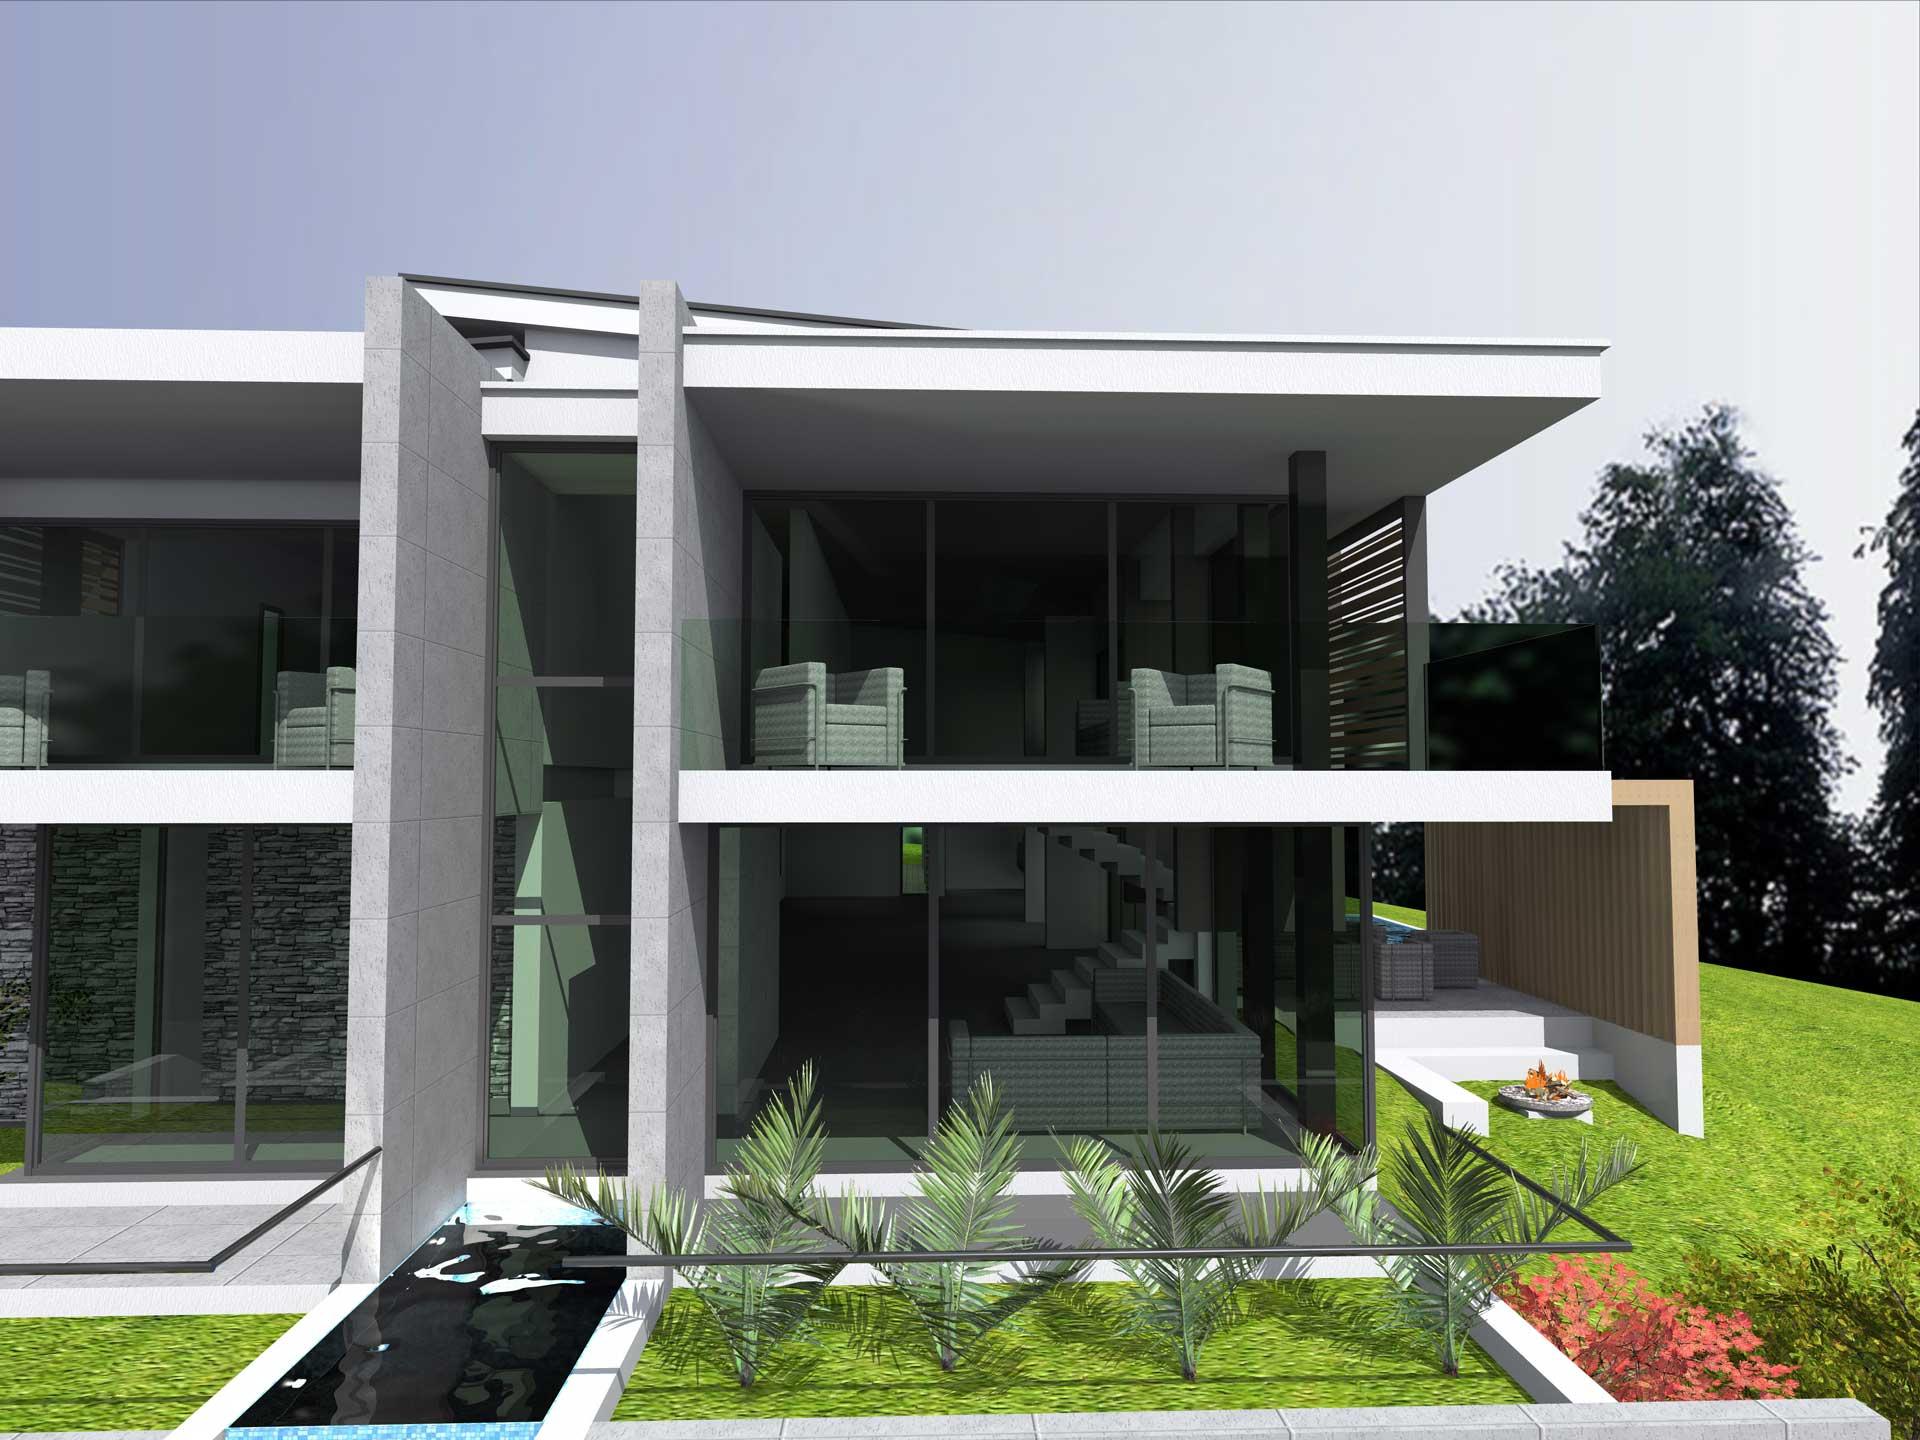 Architechno Architectural, Space Planning & Project Management Services Pietermaritzburg